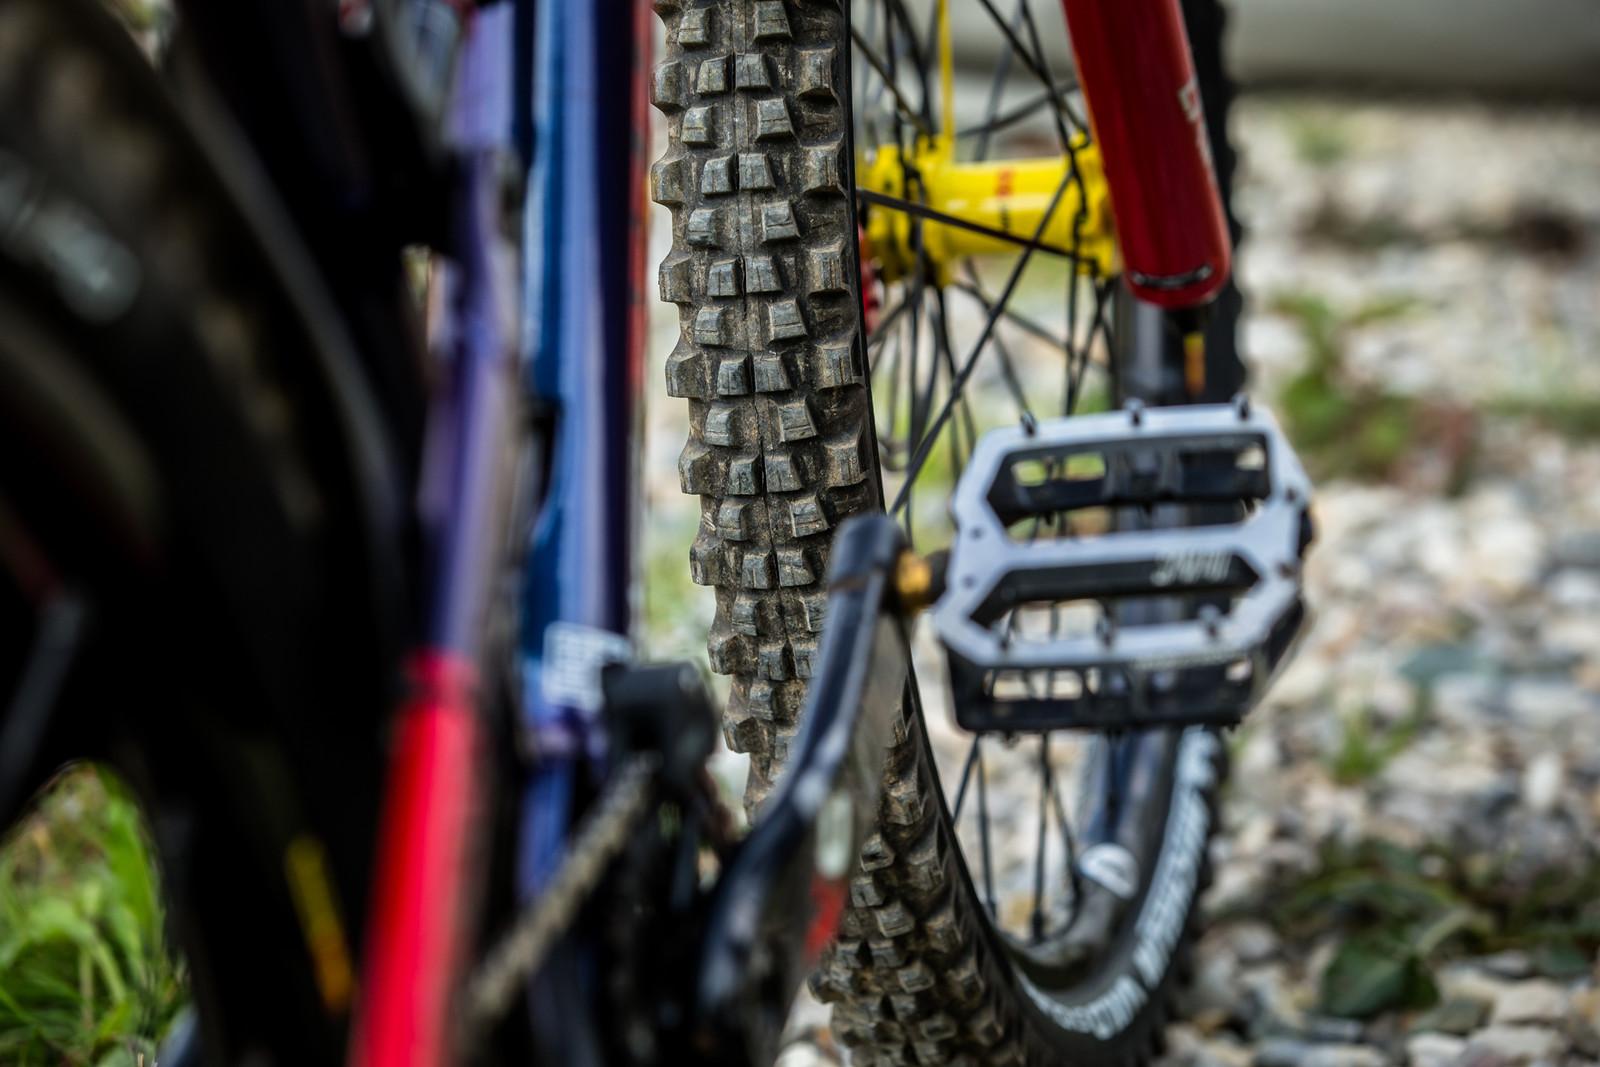 Michelin Wild Enduro Prototype Front Tire - WINNING BIKE - Sam Hill's Nukeproof Mega 275 - Mountain Biking Pictures - Vital MTB